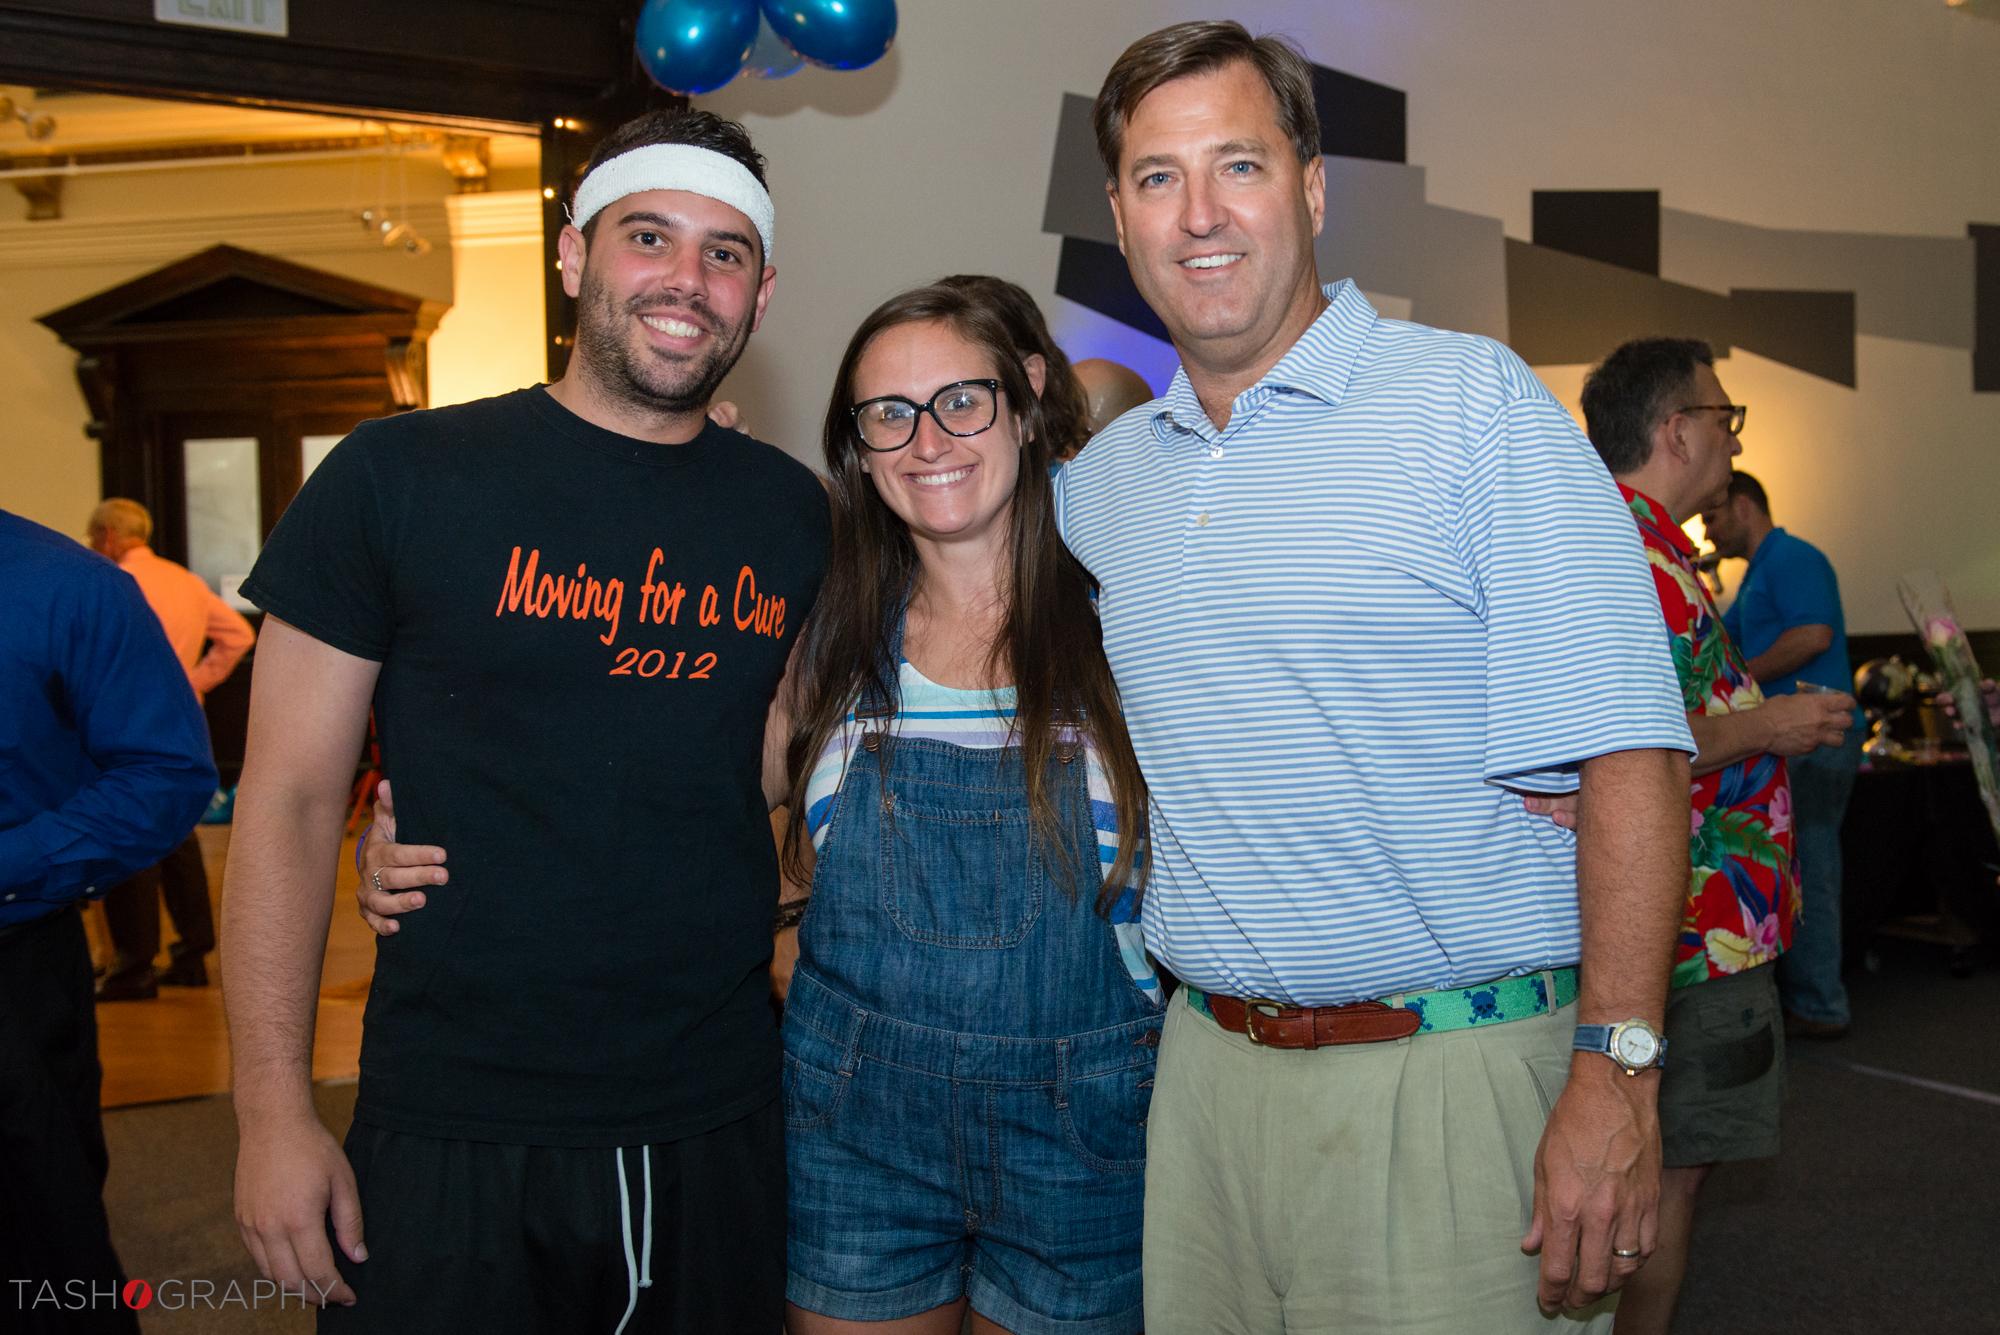 Chuck Theiss, Tara Cancellieri, and Dick OHare